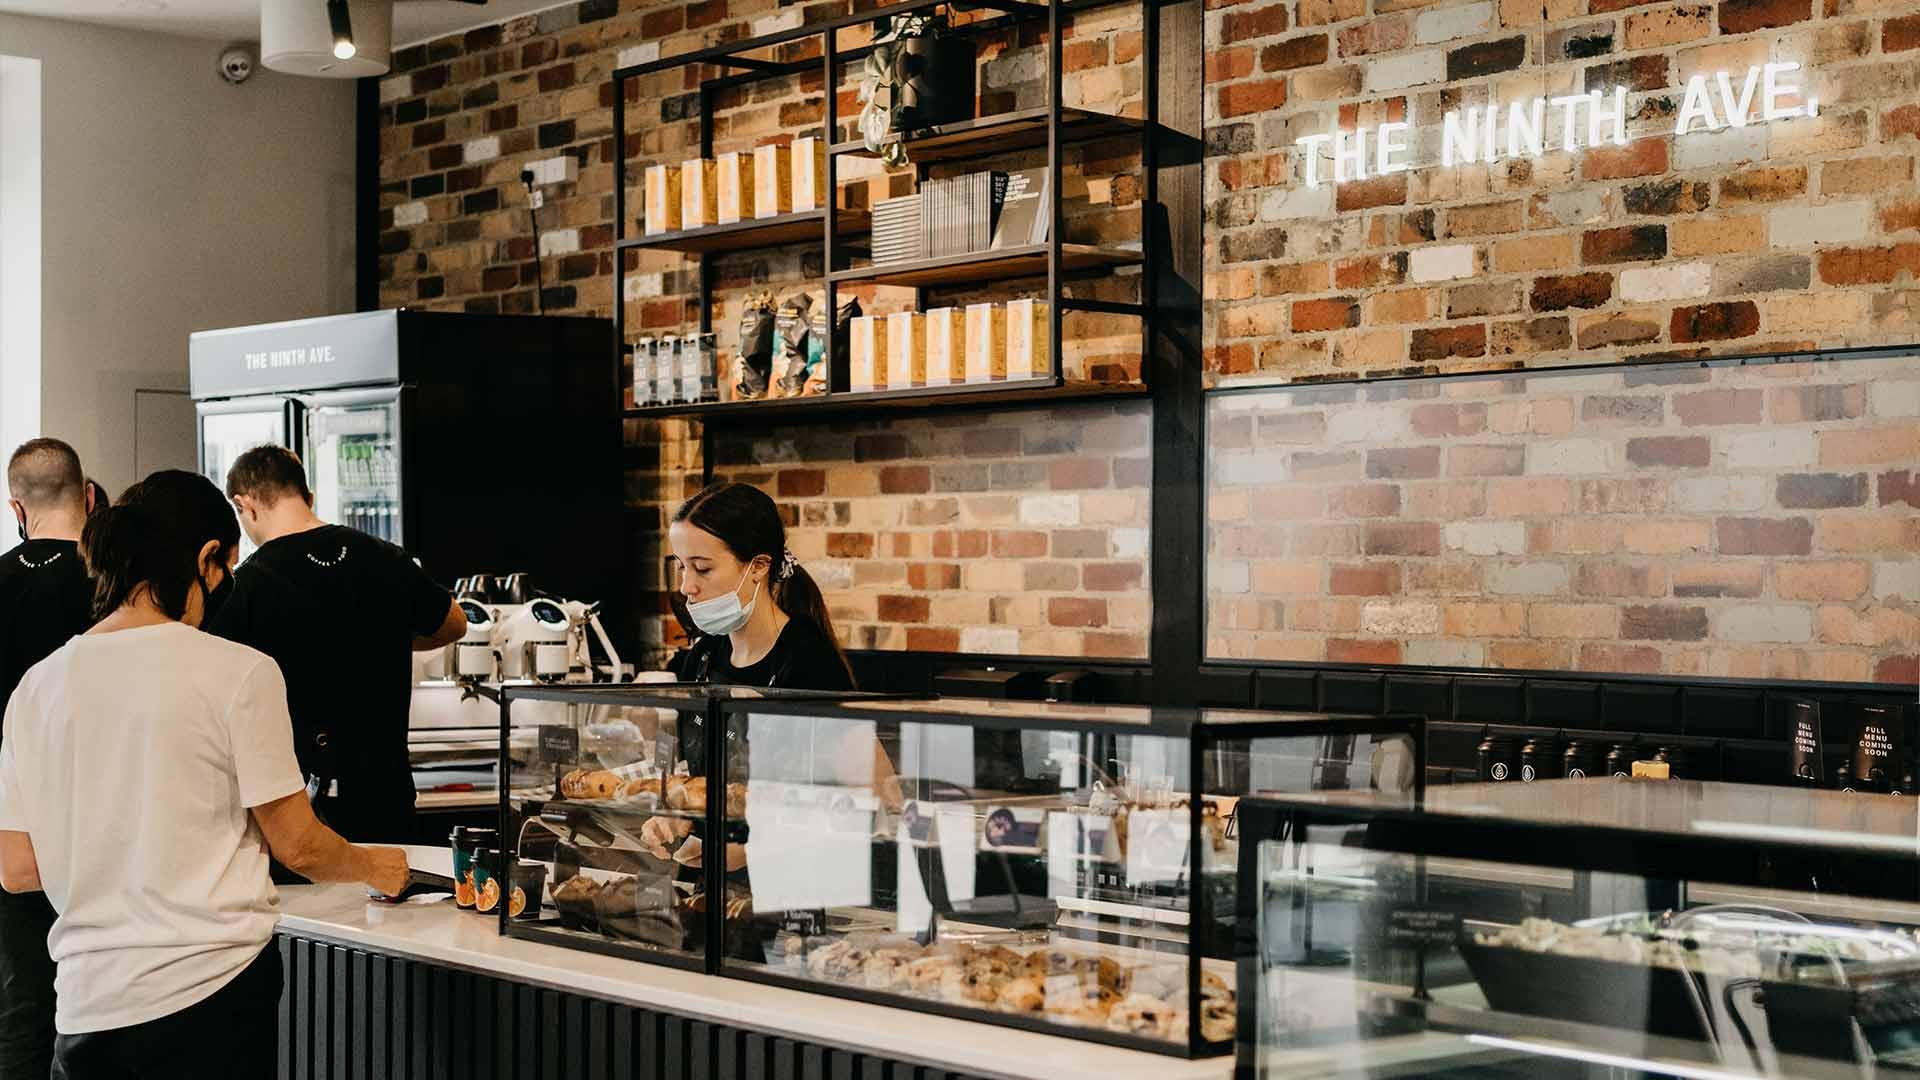 the ninth ave cafe,